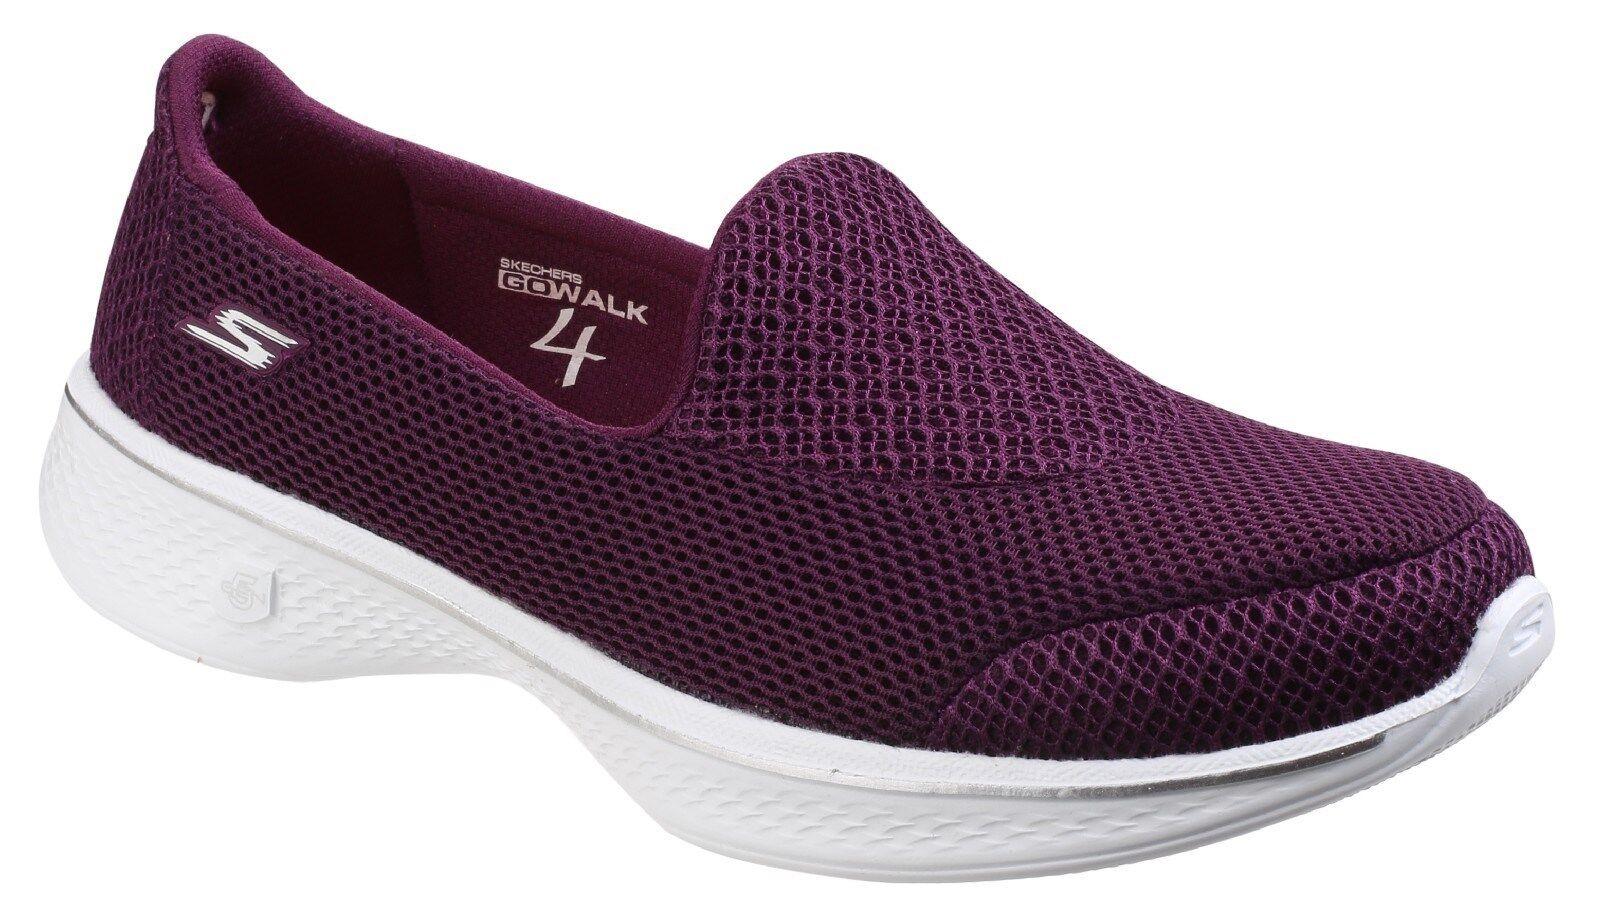 9aae7fa5 Skechers Go Walk 4 Propel Trainers Womens Memory Foam Fashion Sports Shoes